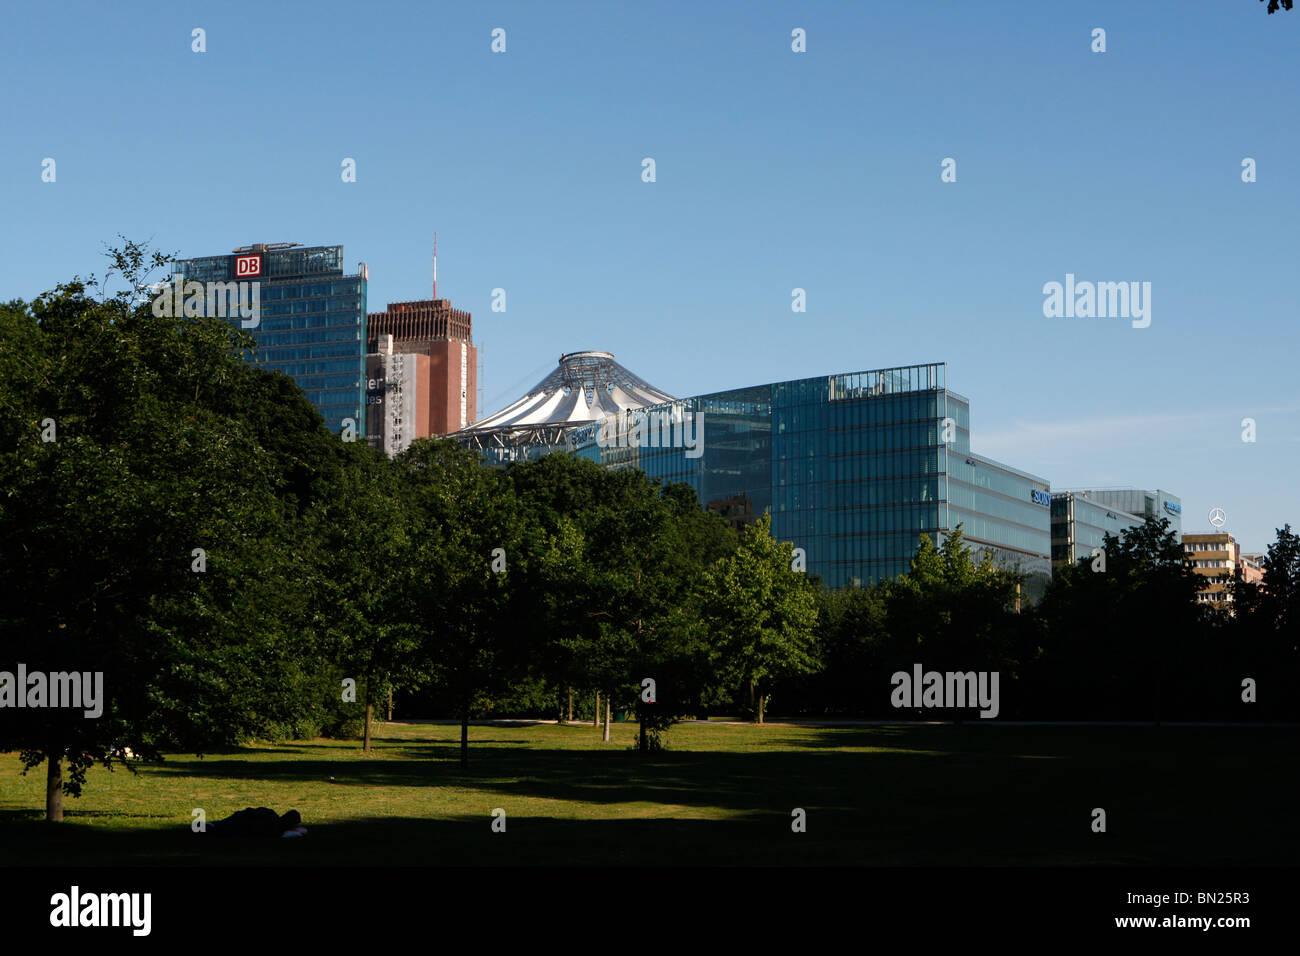 Berlin's central park at Tiergarten Stock Photo